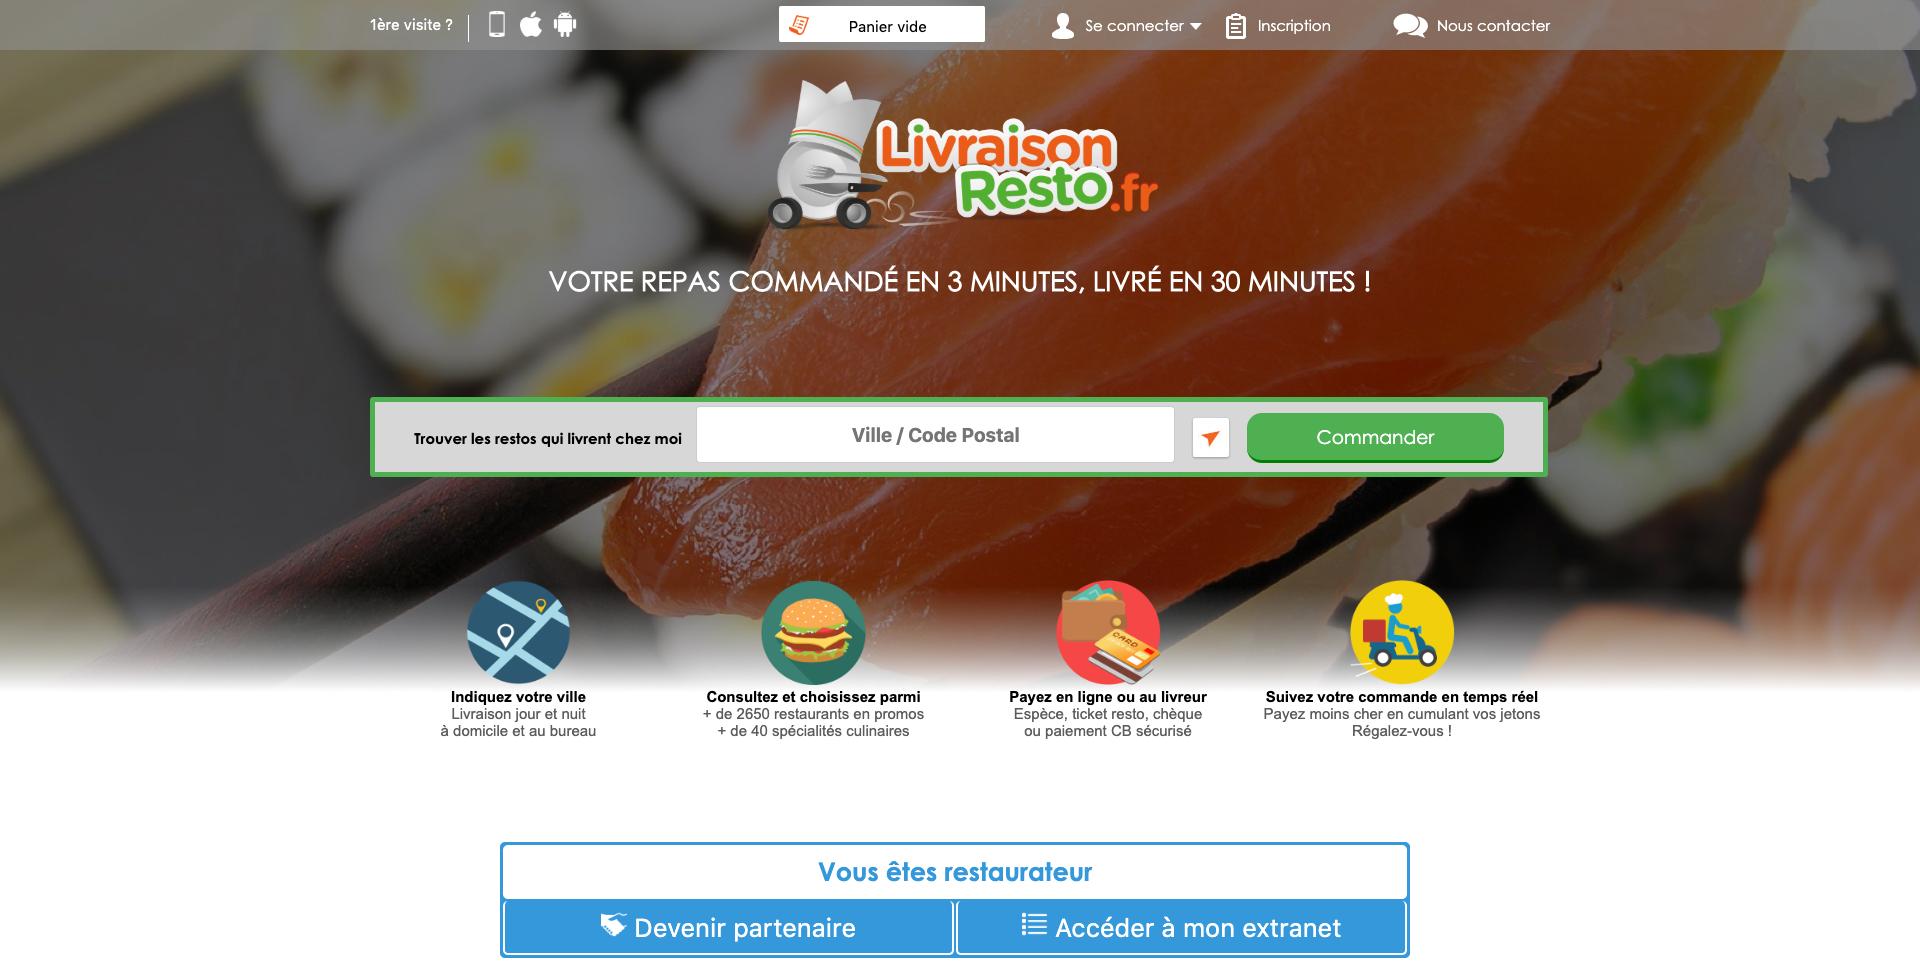 LivraisonResto.fr